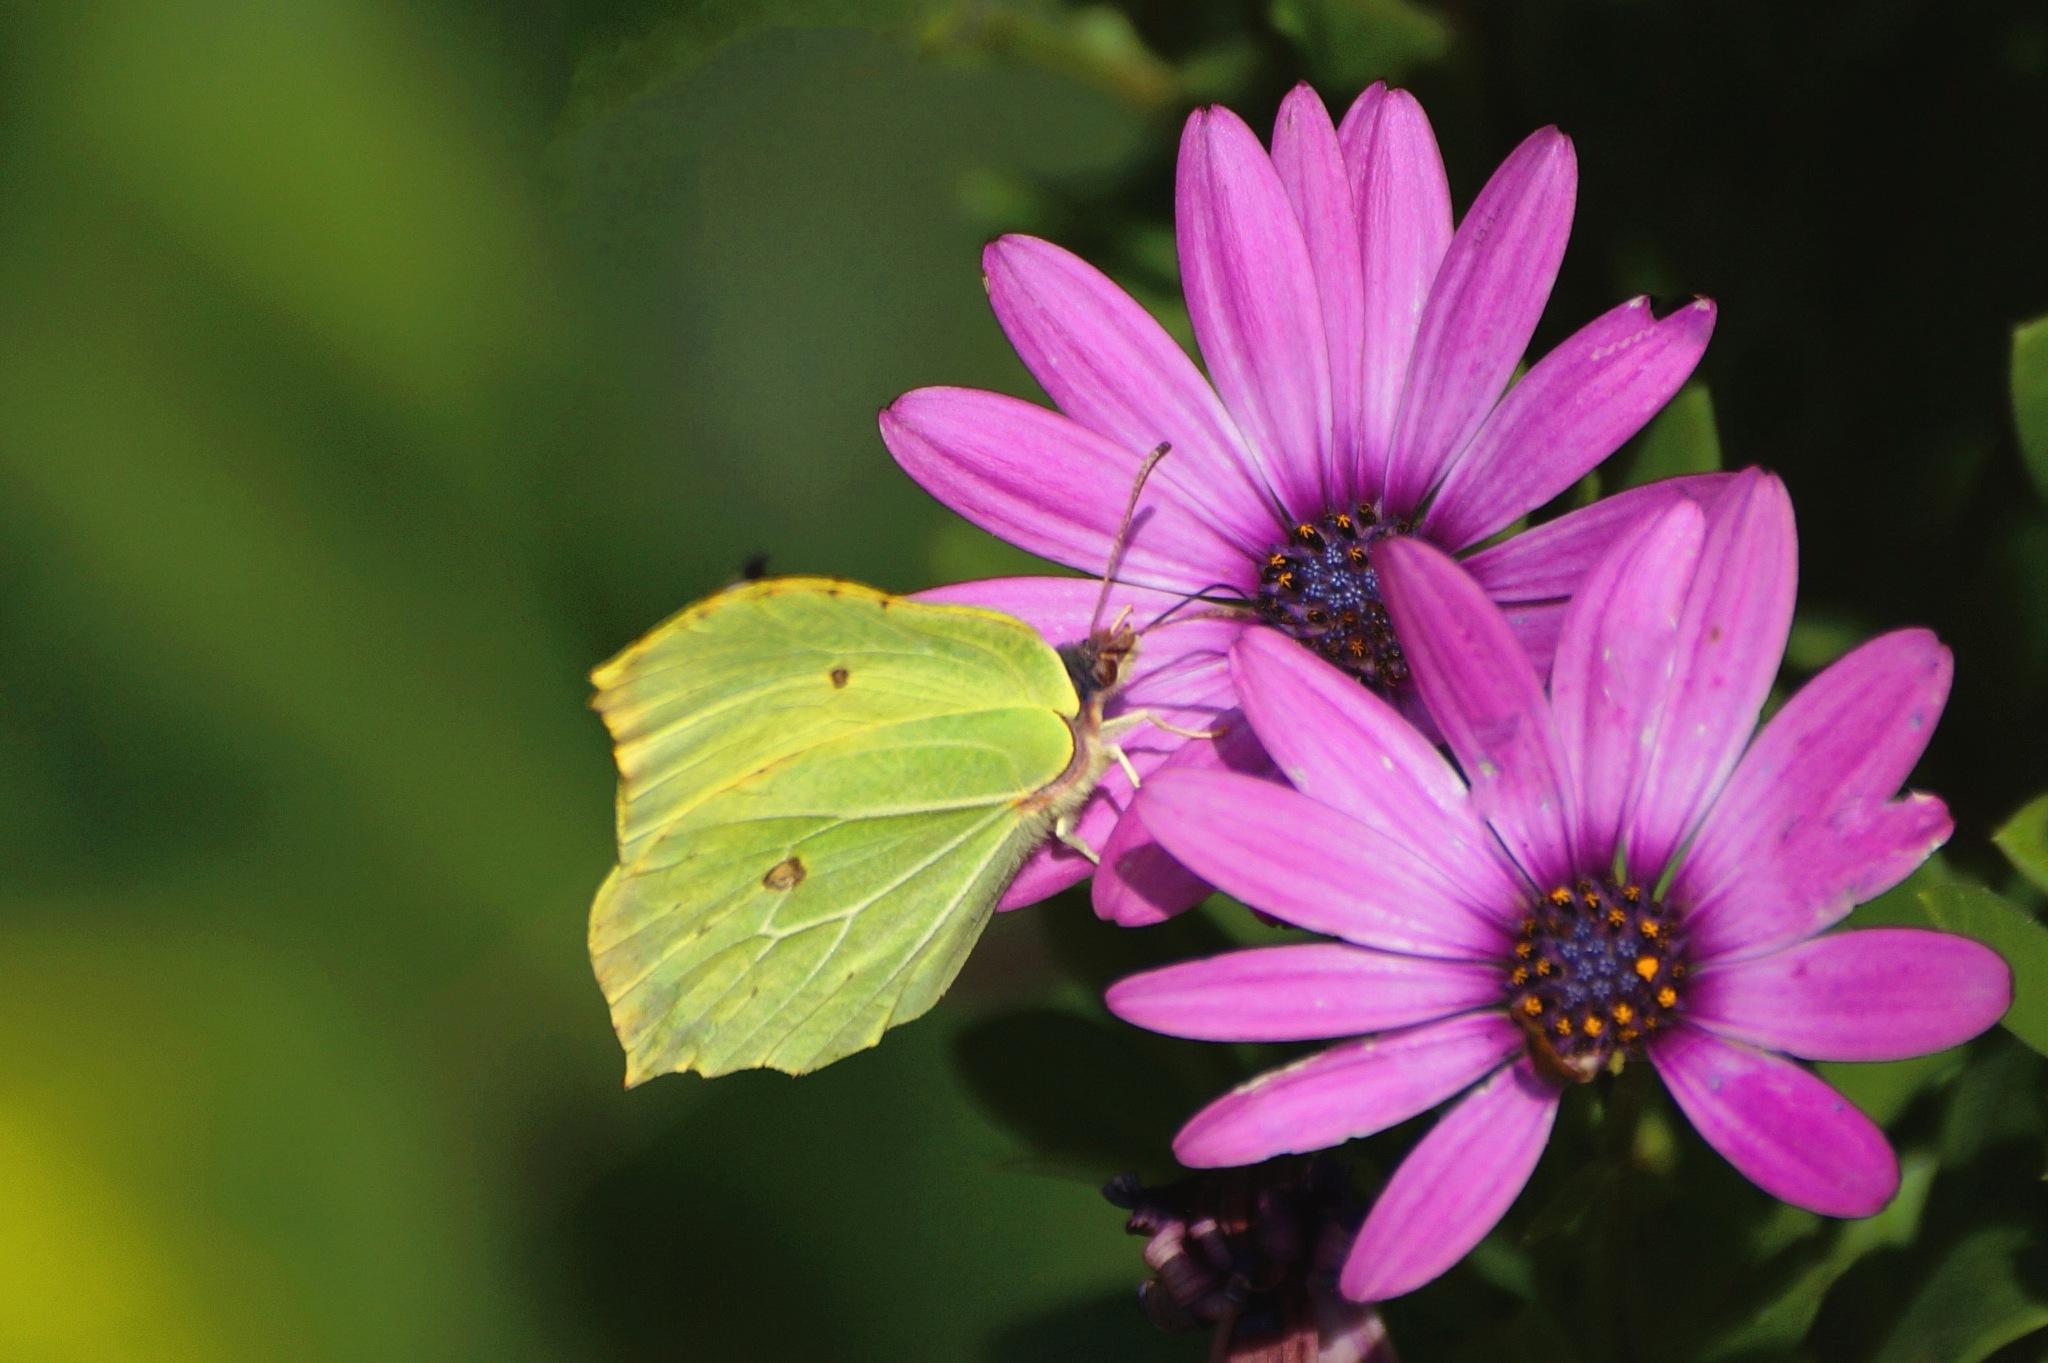 Butterfly on Daisy by Marian Baay